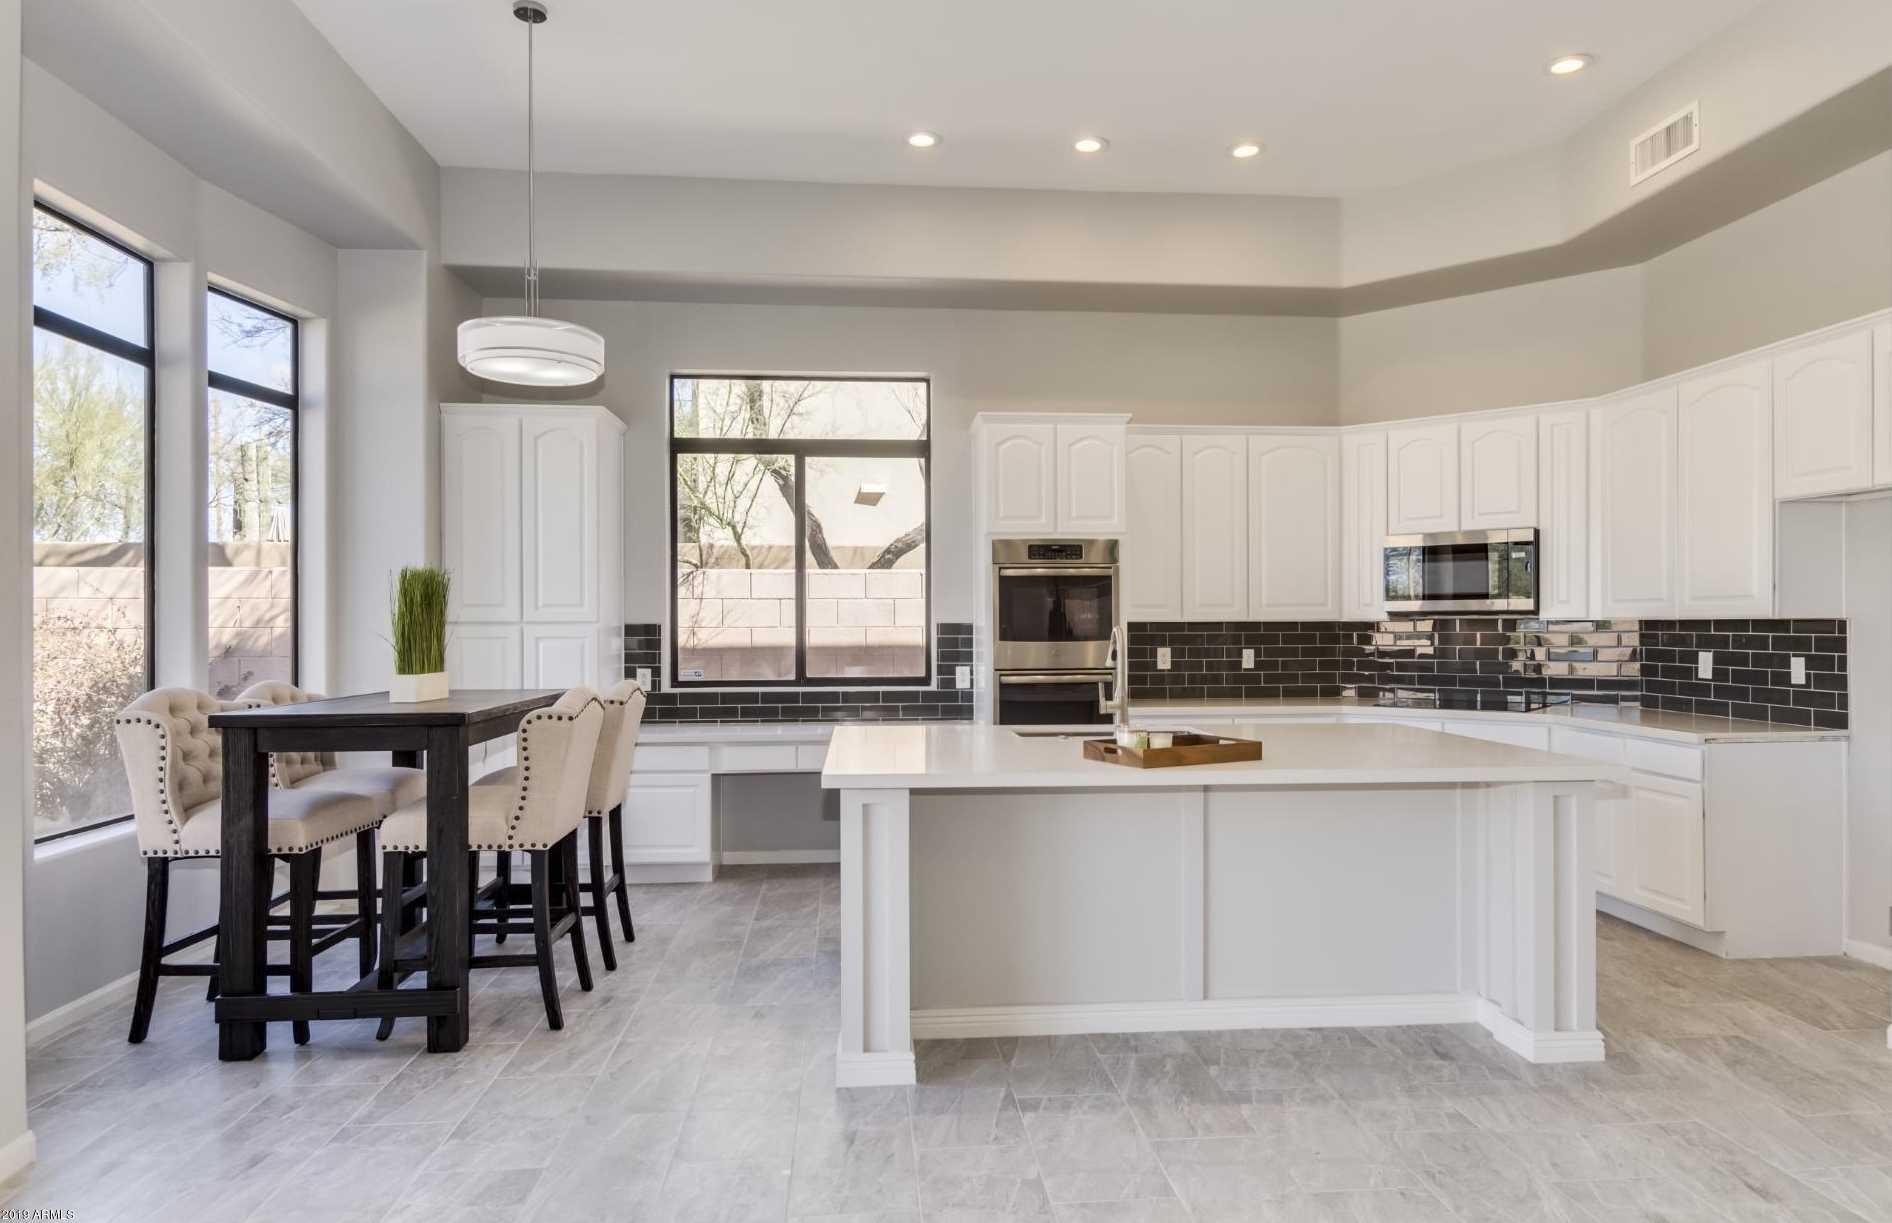 $529,000 - 4Br/3Ba - Home for Sale in Desert Ridge Parcel 4.17, Phoenix